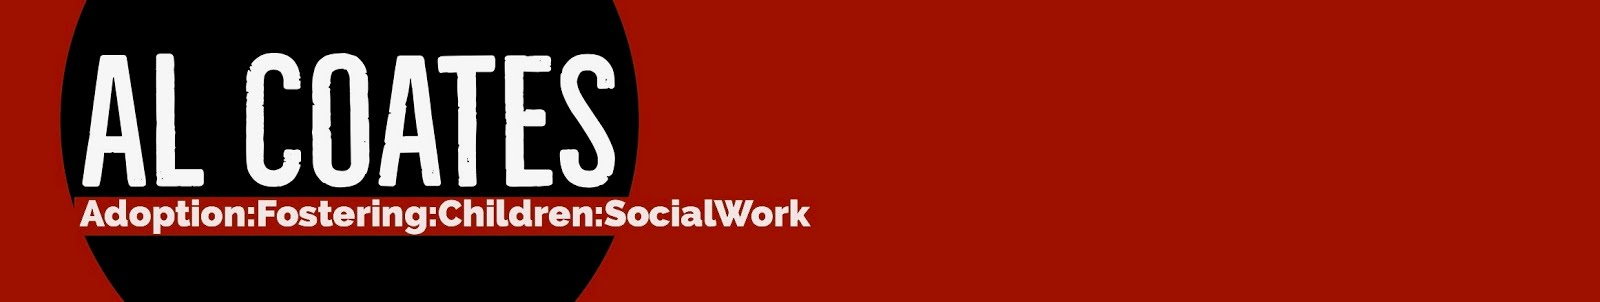 Al Coates-领养:培养:社会工作